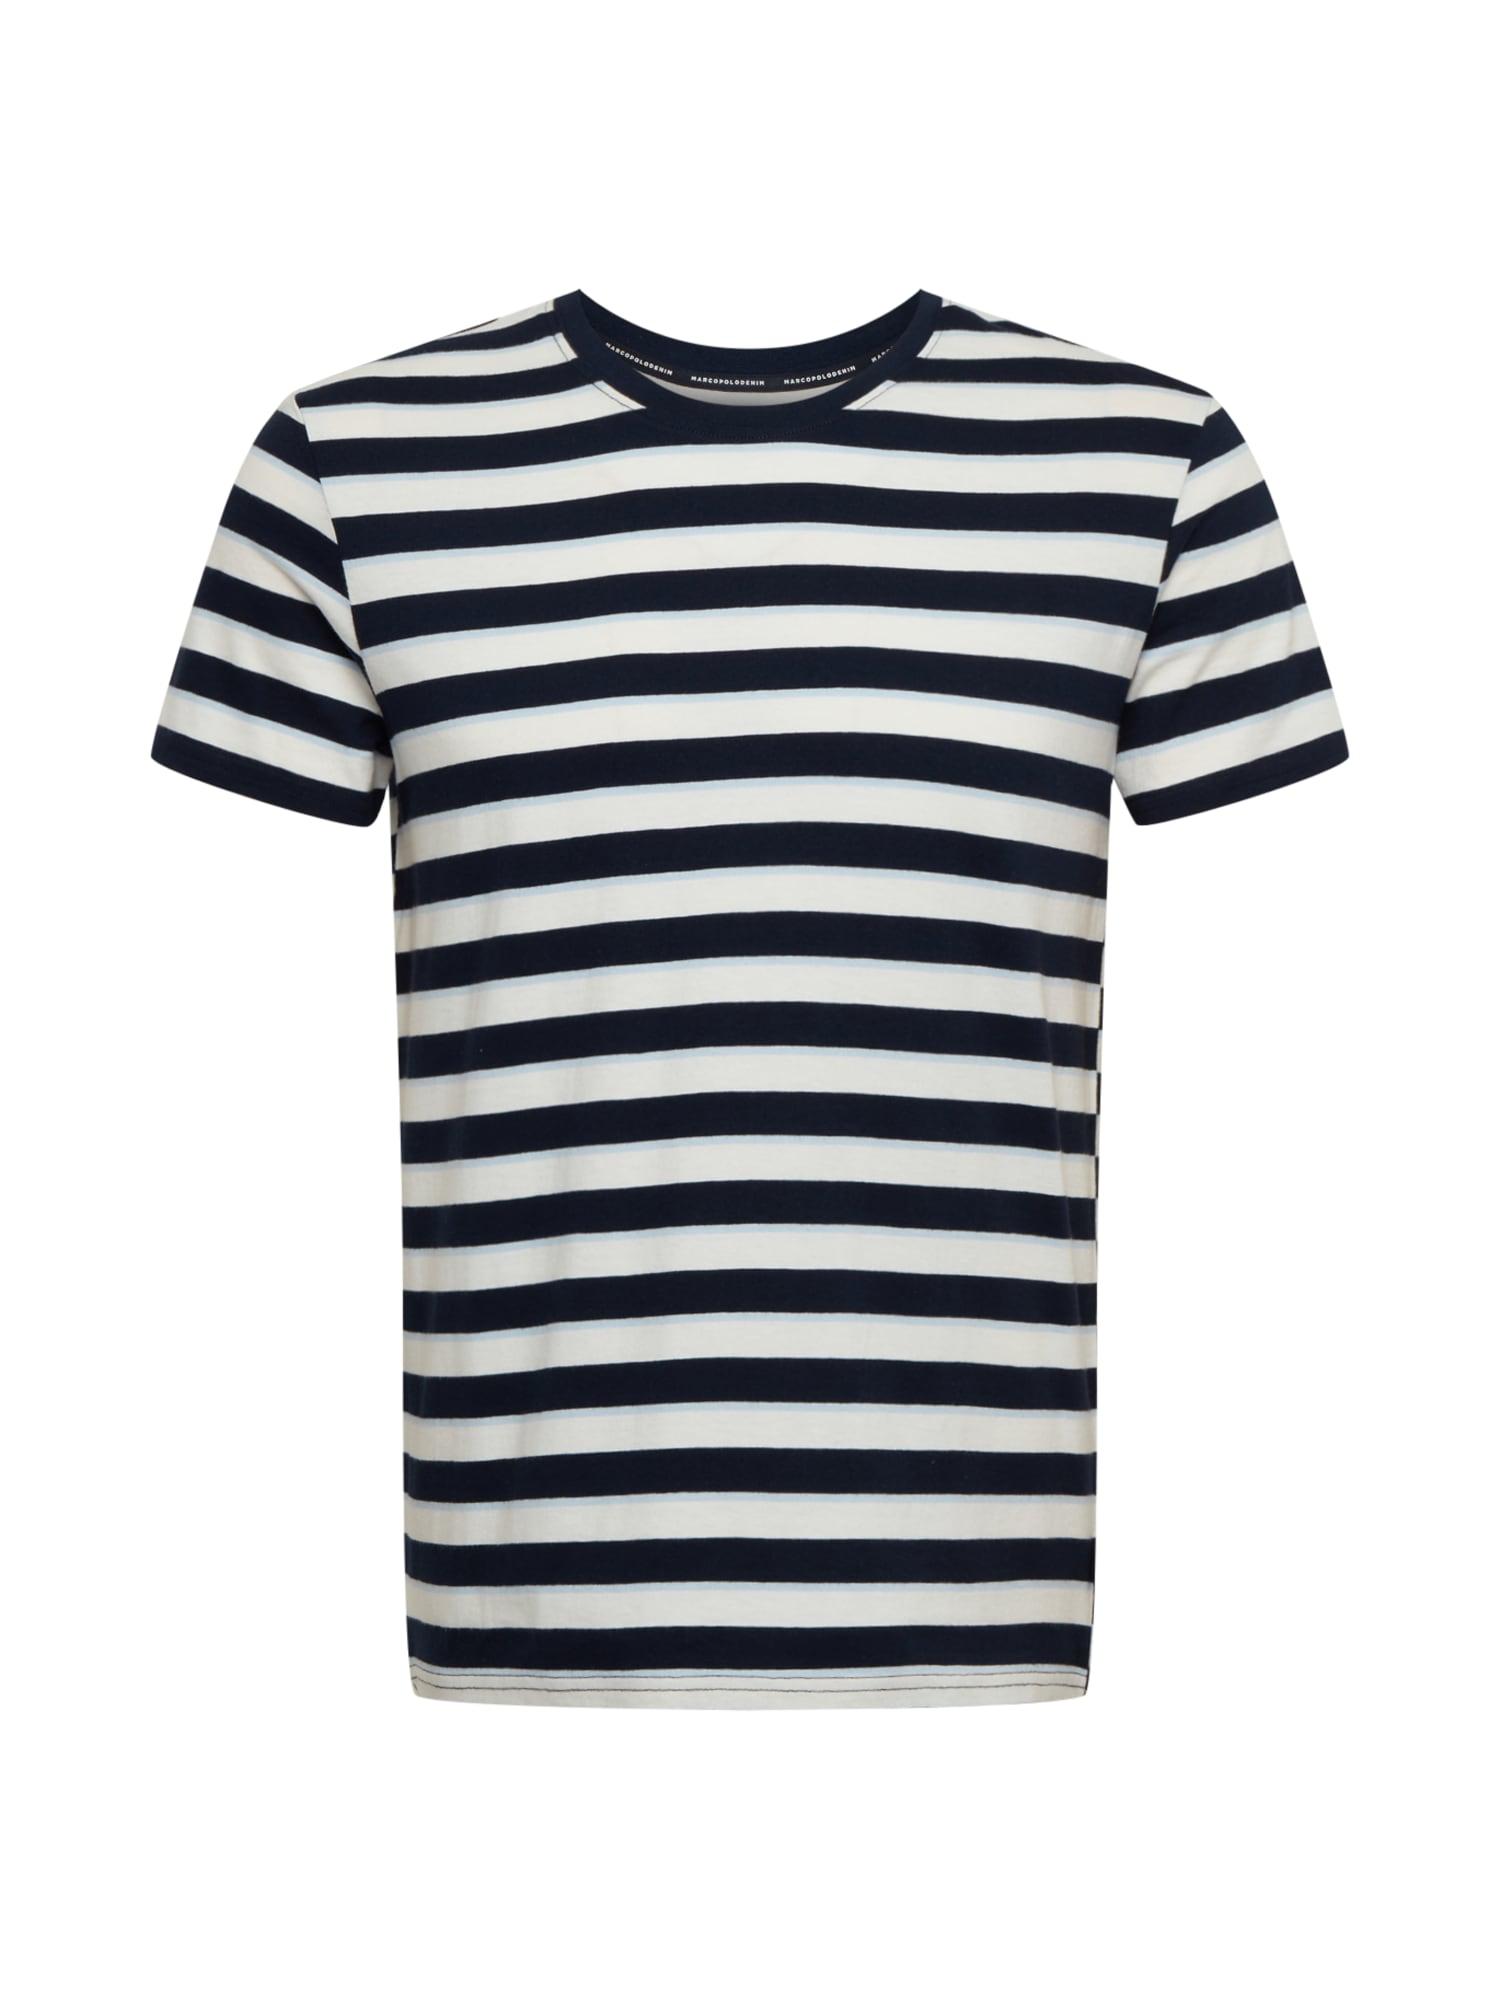 Marc O'Polo DENIM Marškinėliai mišrios spalvos / mėlyna